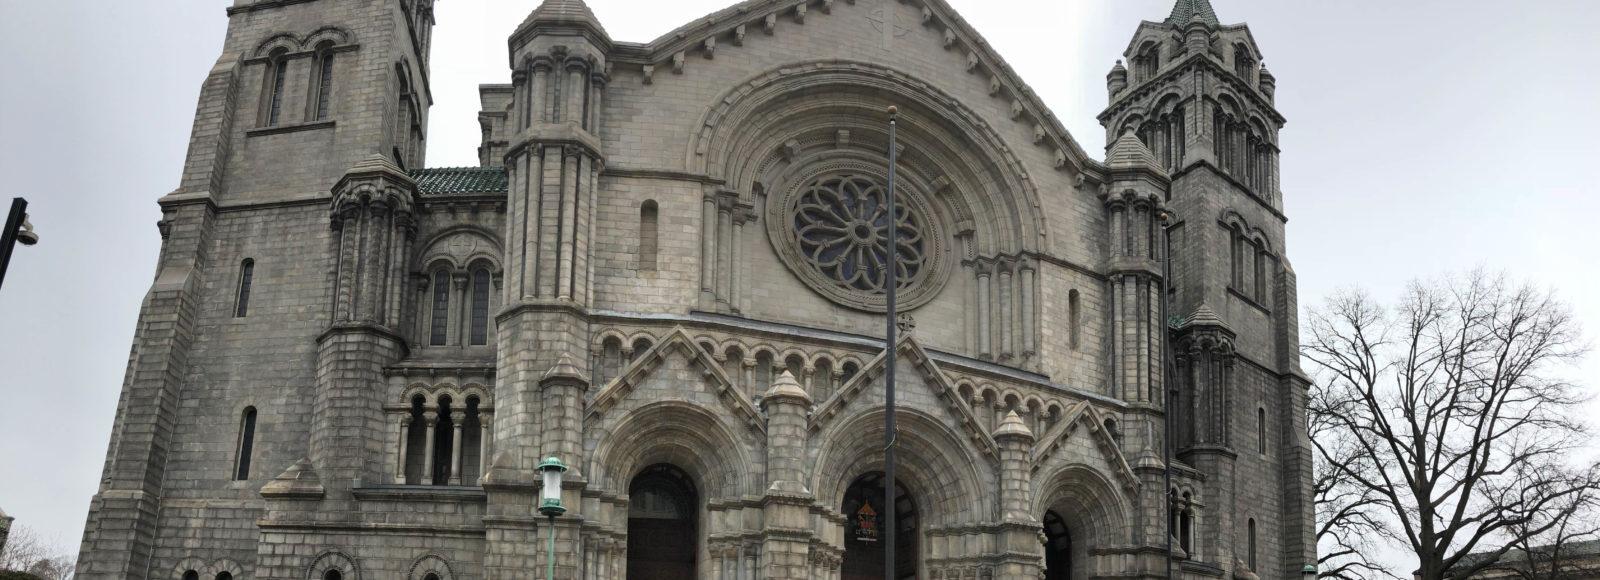 jim west collierville tn church photo